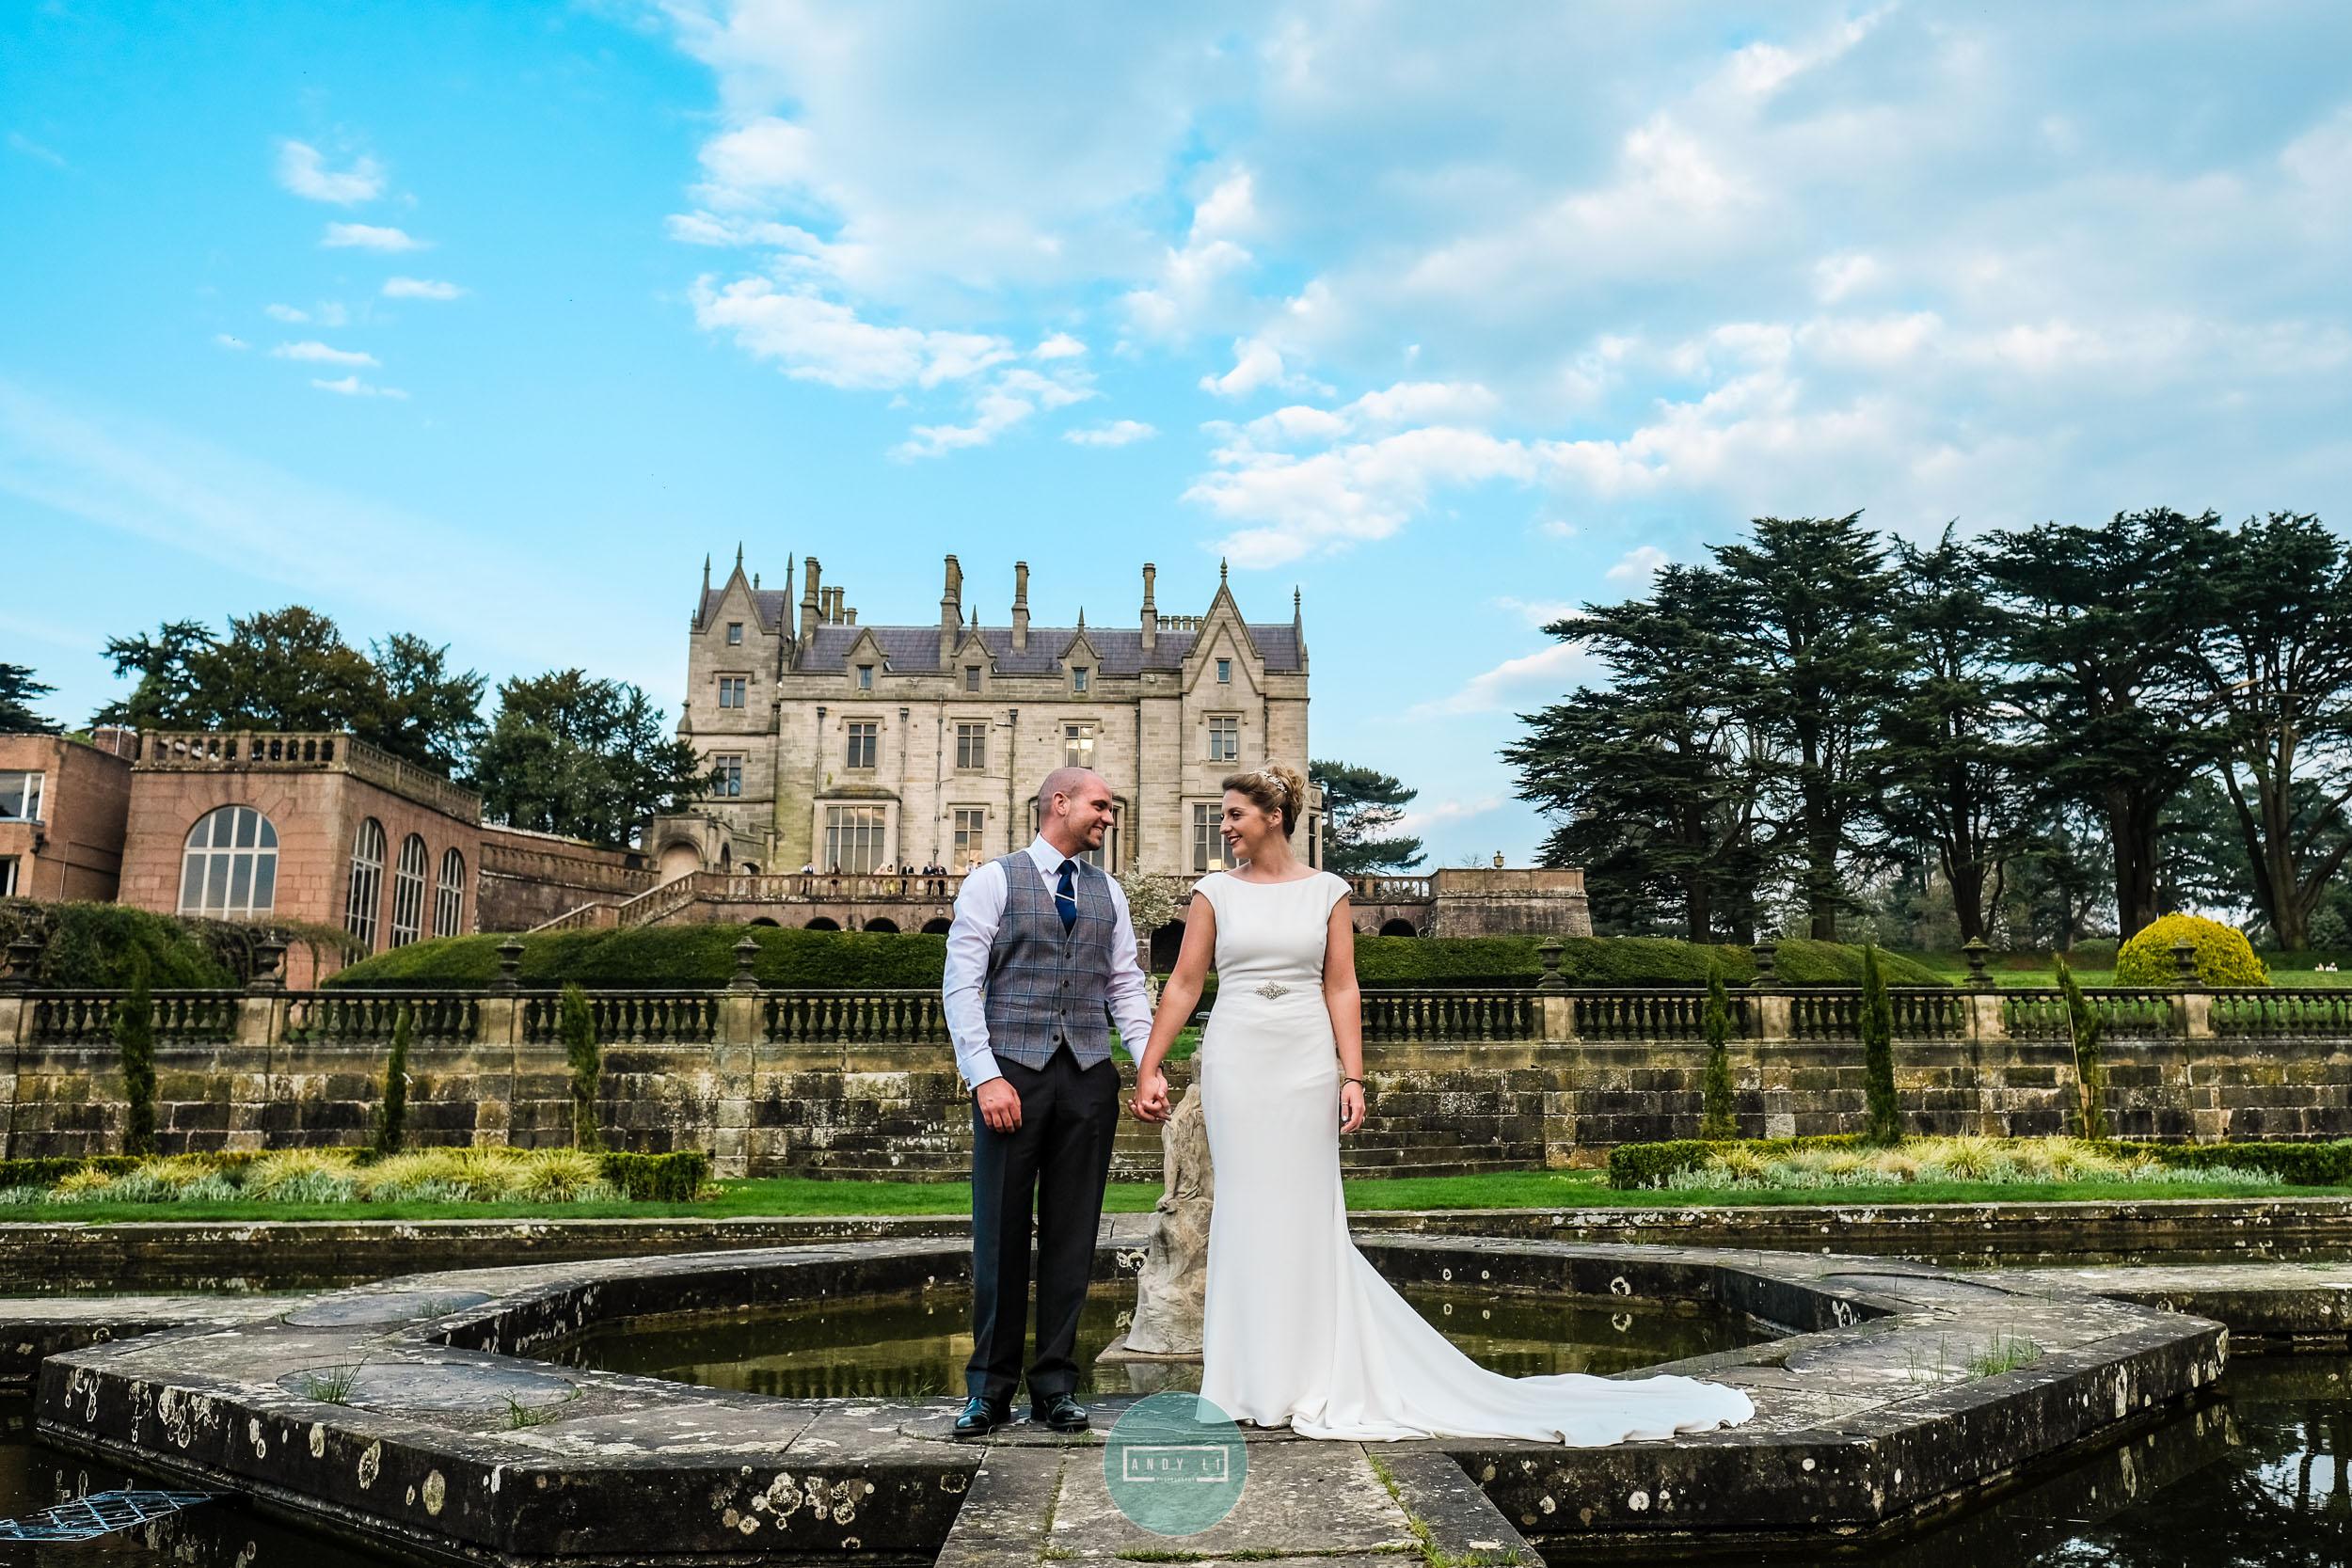 Lilleshall Hall Wedding Photographer-068-XPRO1490.jpg